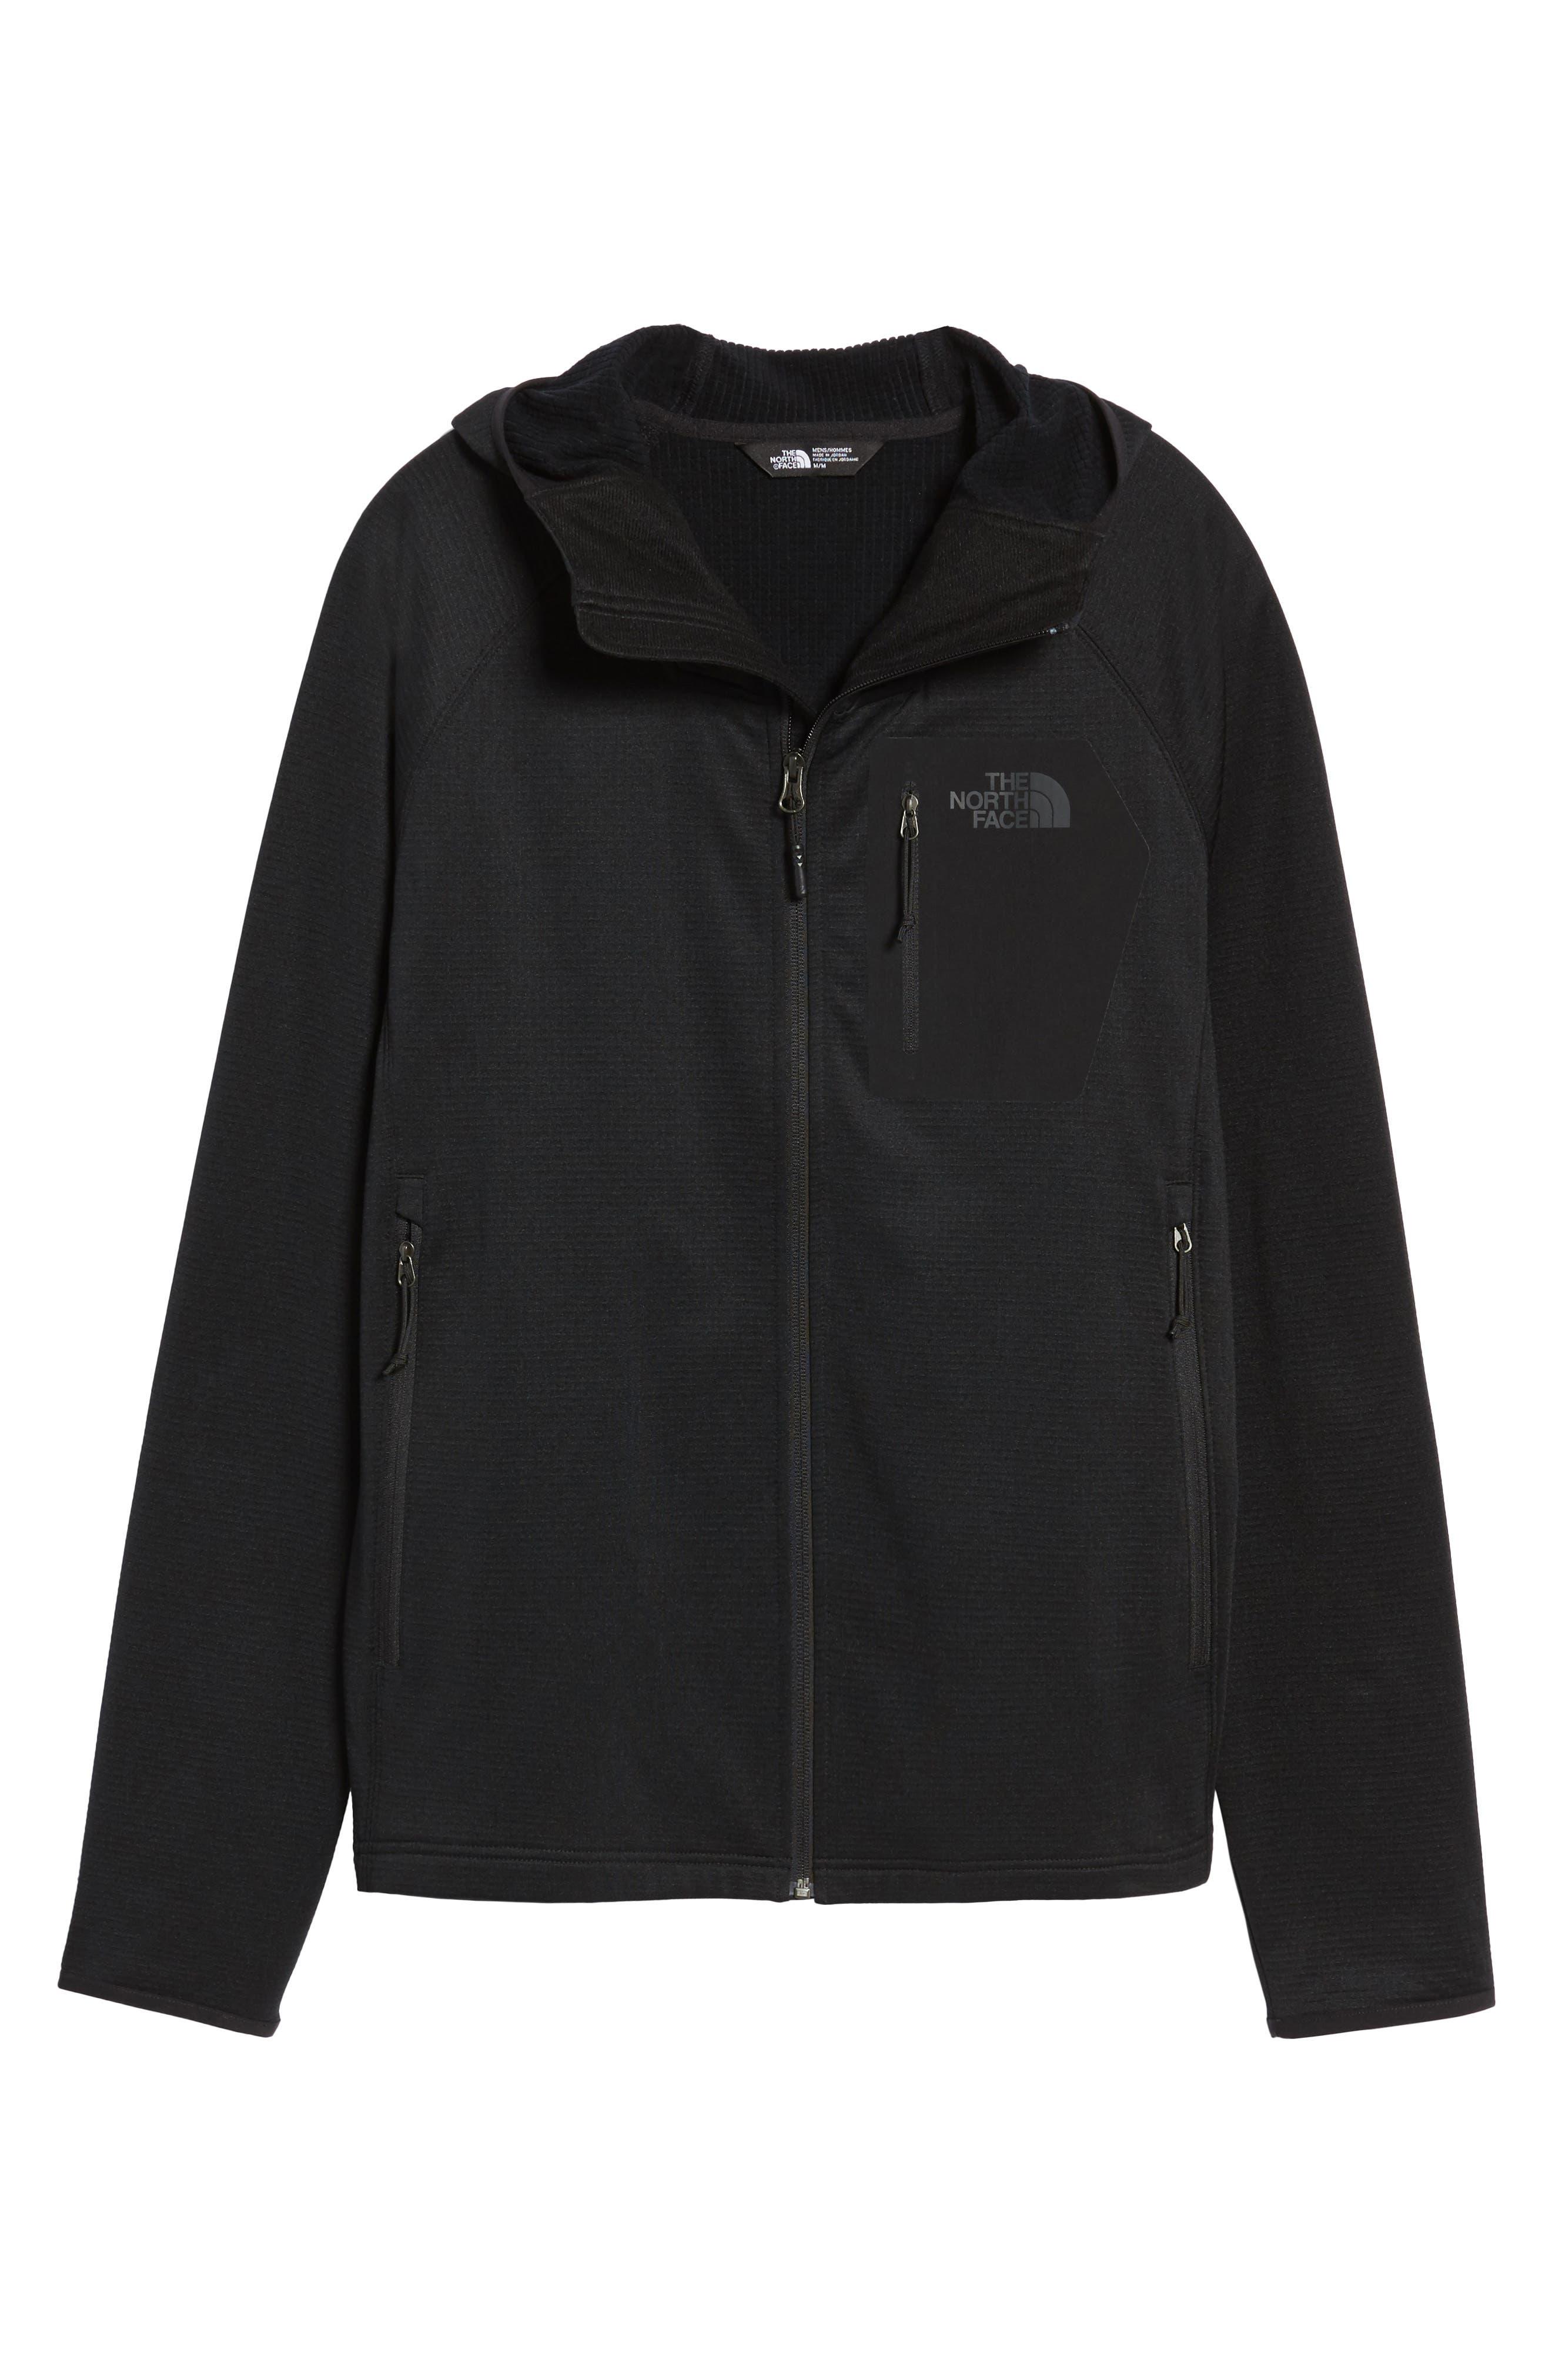 Borod Zip Fleece Jacket,                             Alternate thumbnail 7, color,                             BLACK/ BLACK